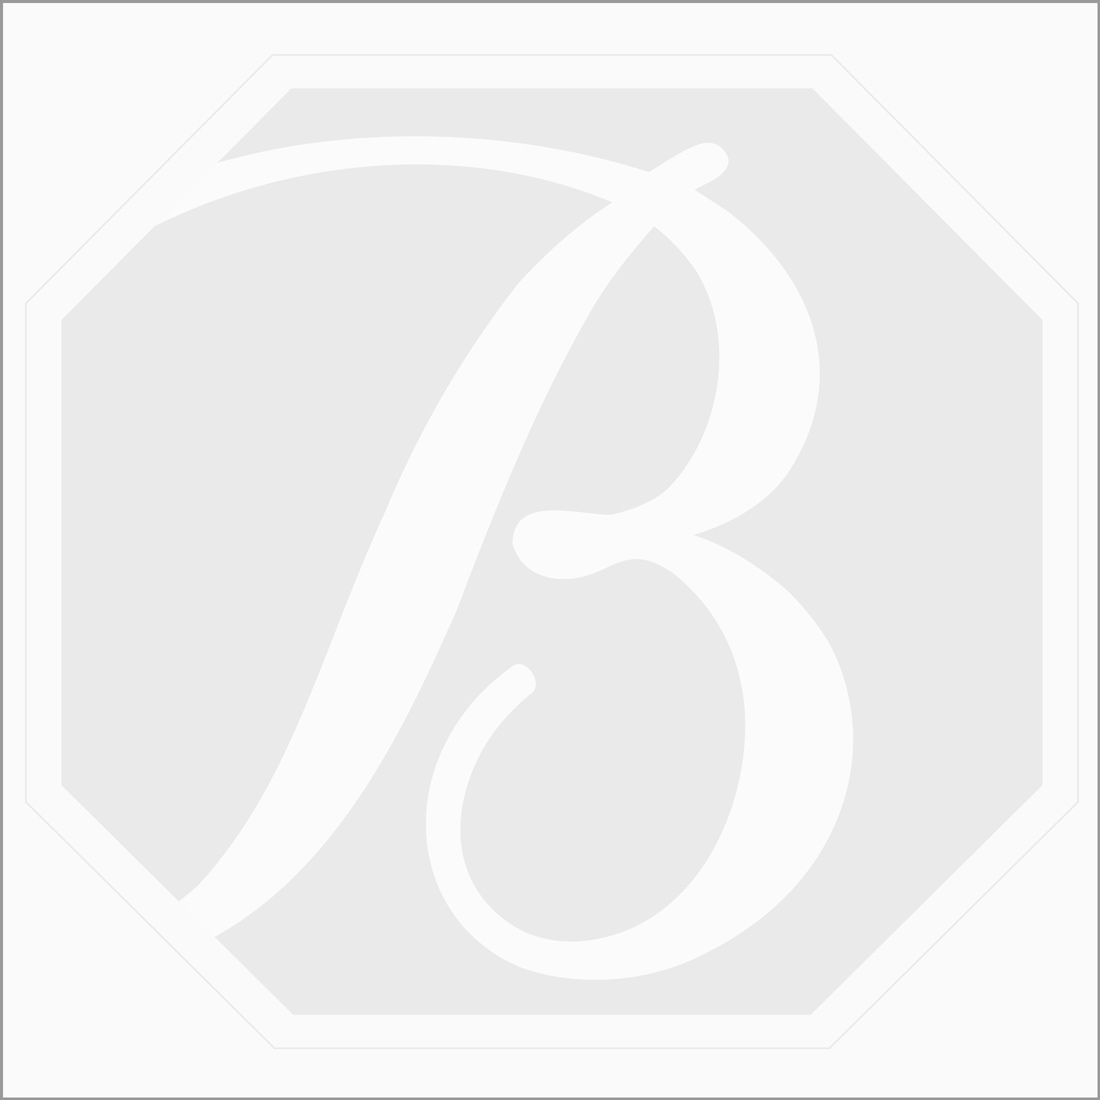 2 Black Diamond Cushion Shape Rose Cut Diamonds - 1.05 cts. (DRC1228)